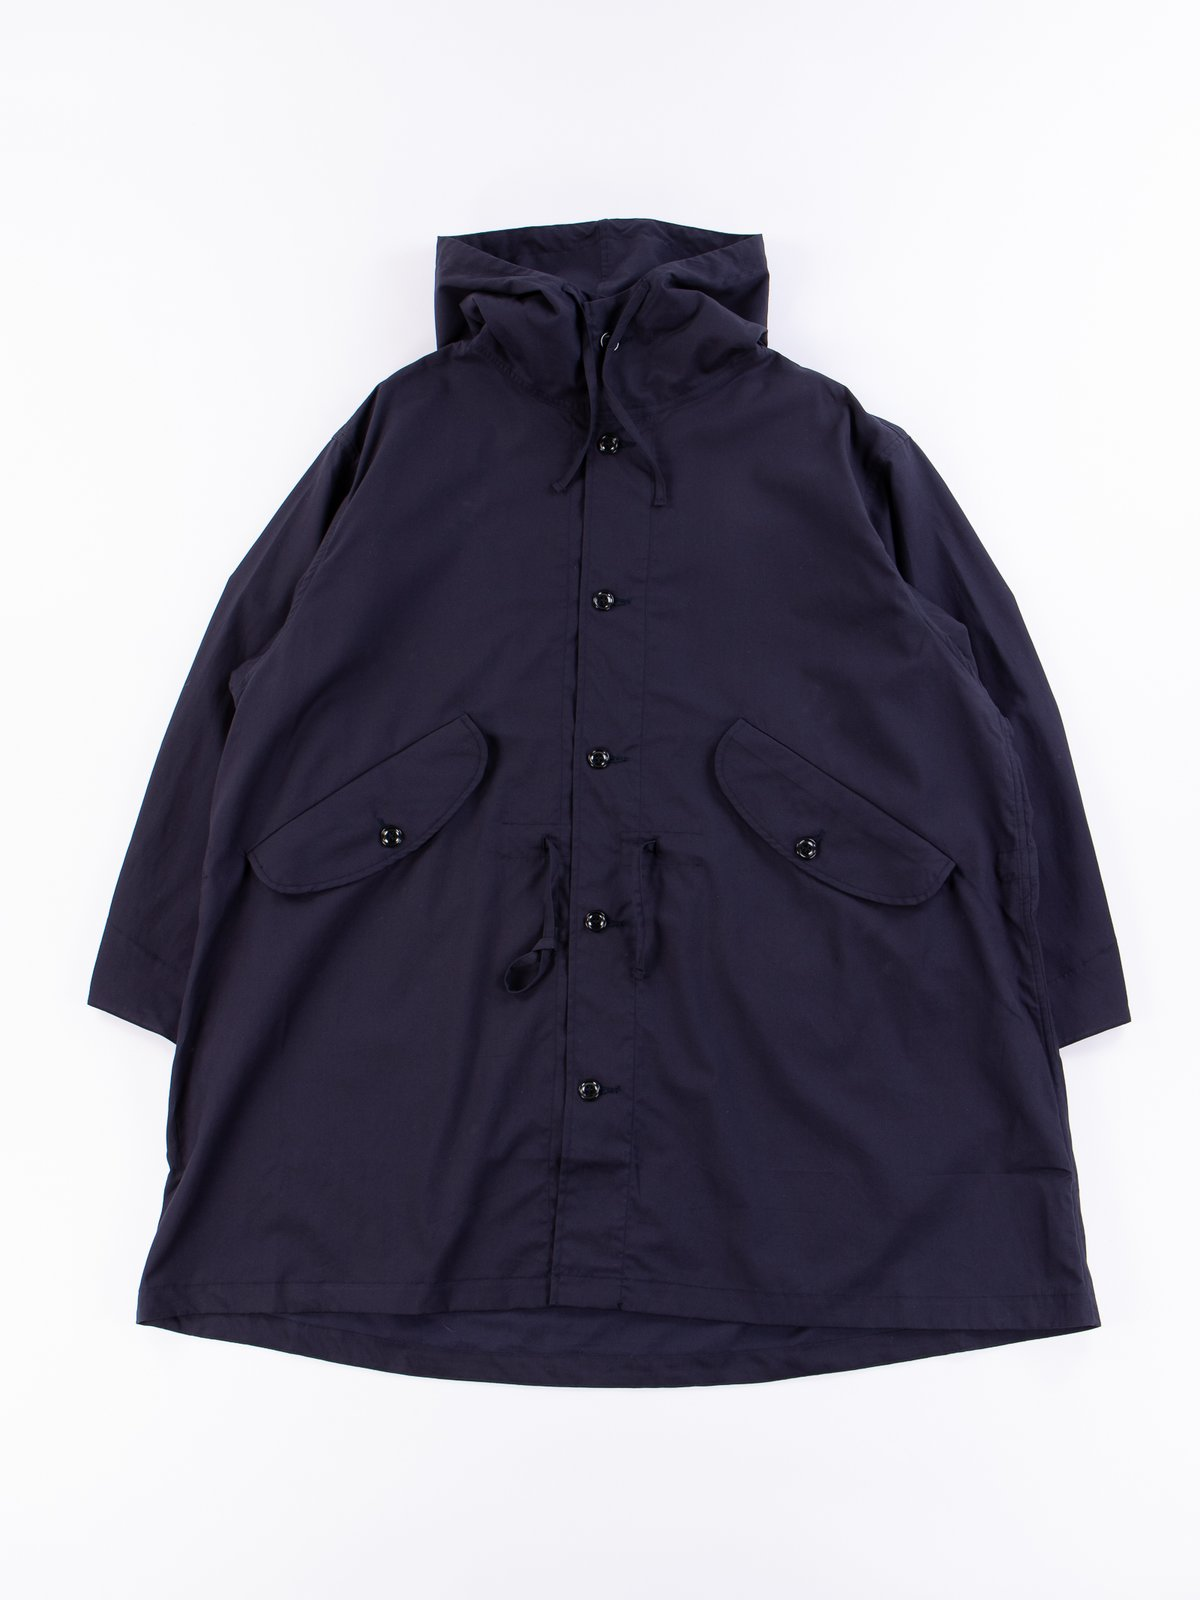 Navy Oxford Vancloth Czech Coat - Image 1